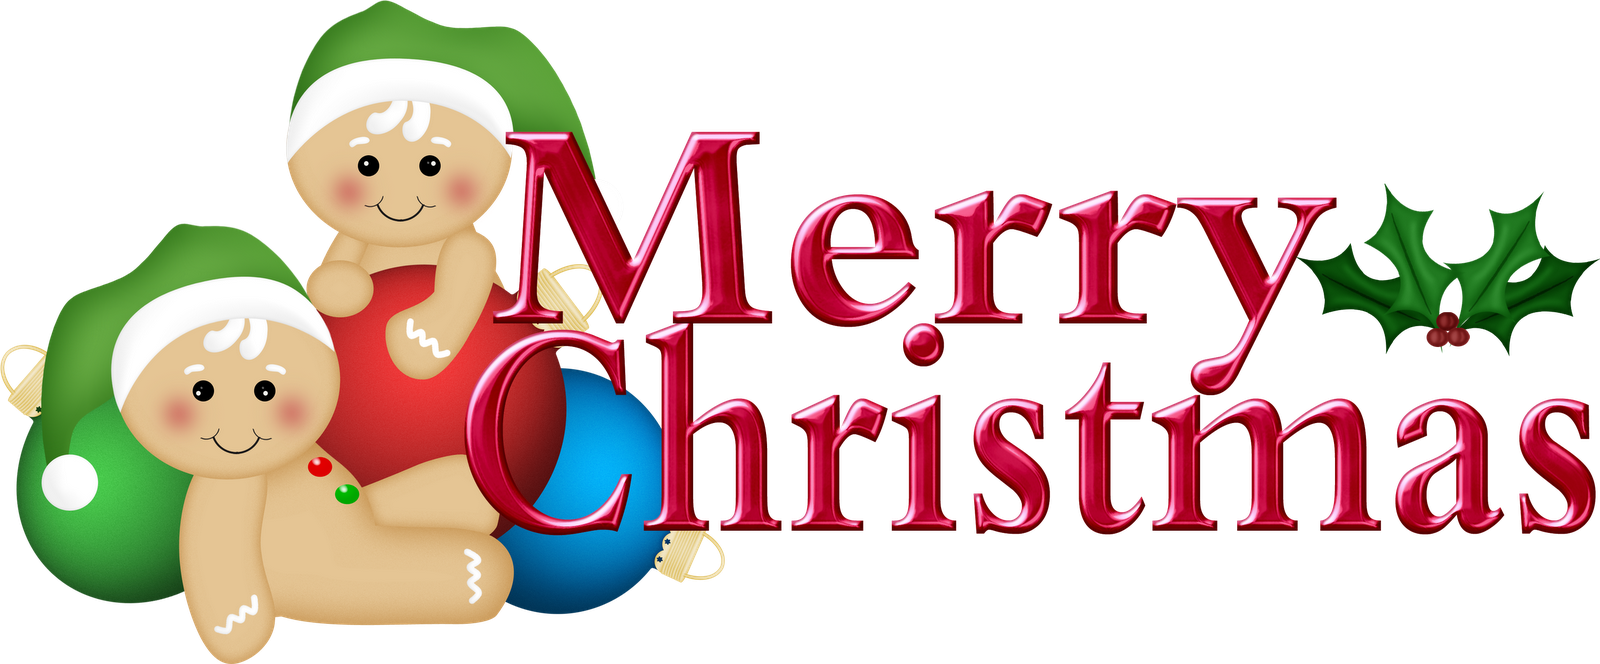 1600x664 Merry Christmas Wallpaper Clip Art Wallpapersafari